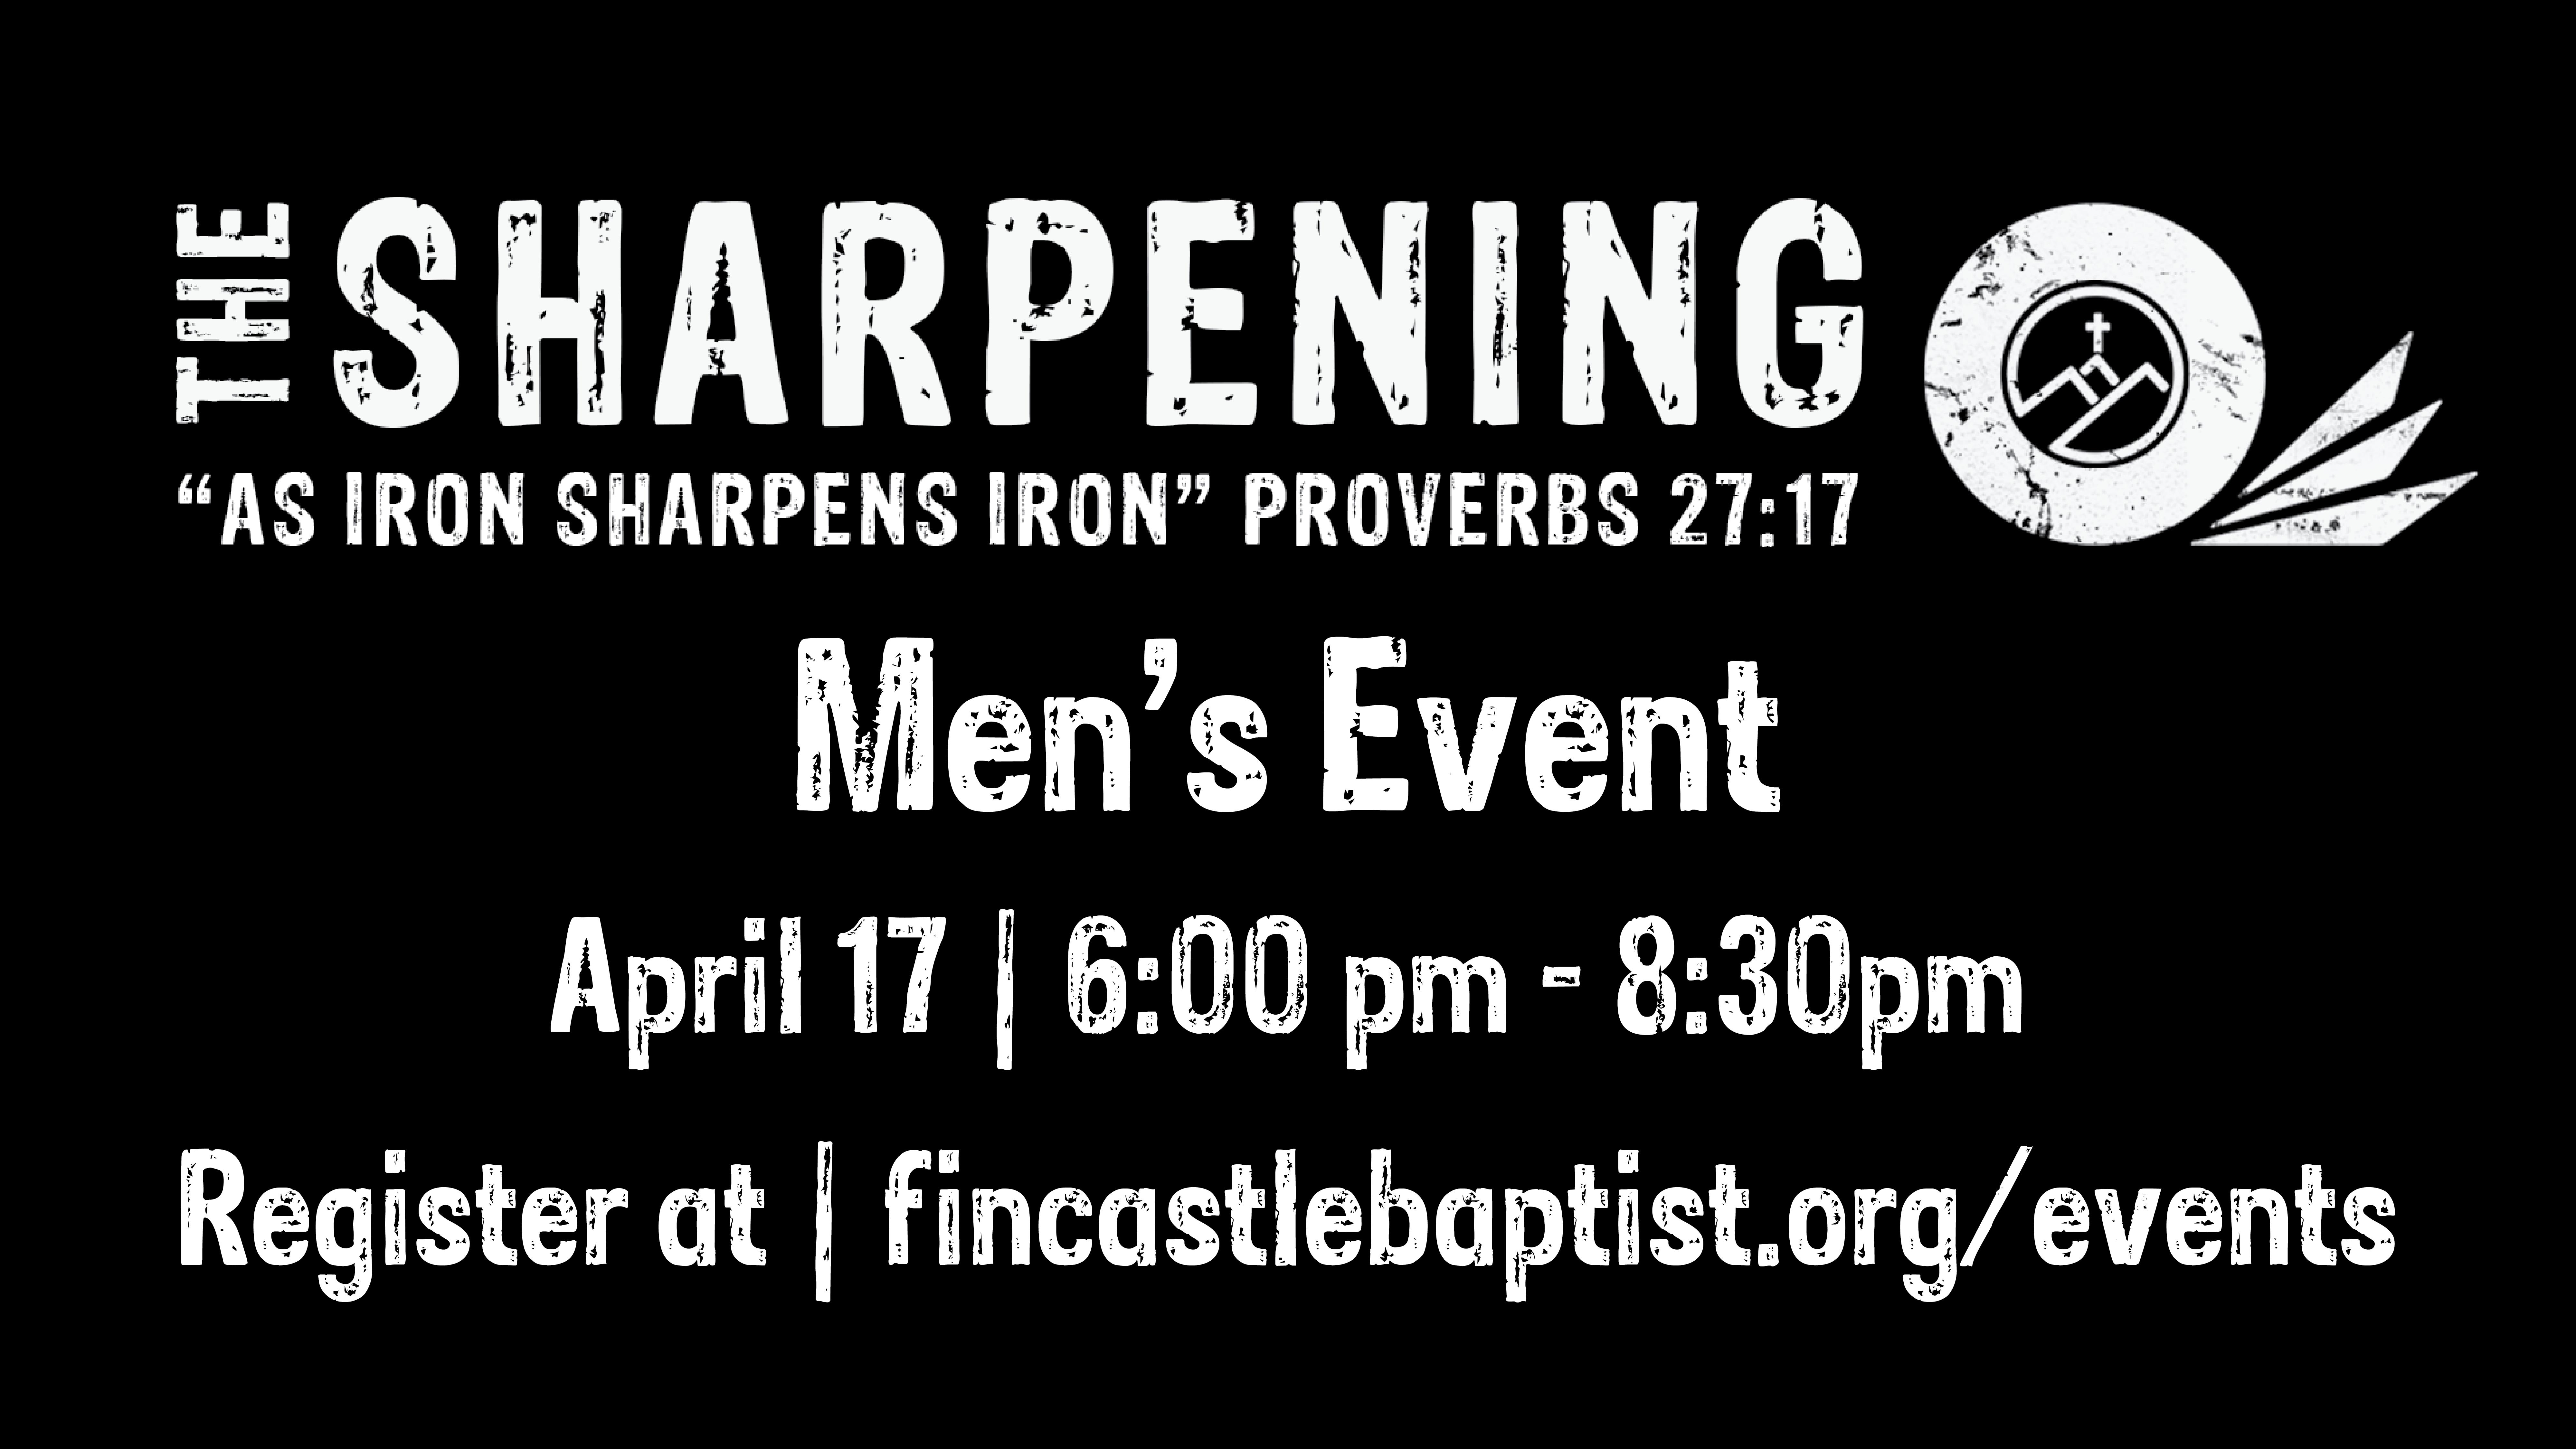 Sharpening Event